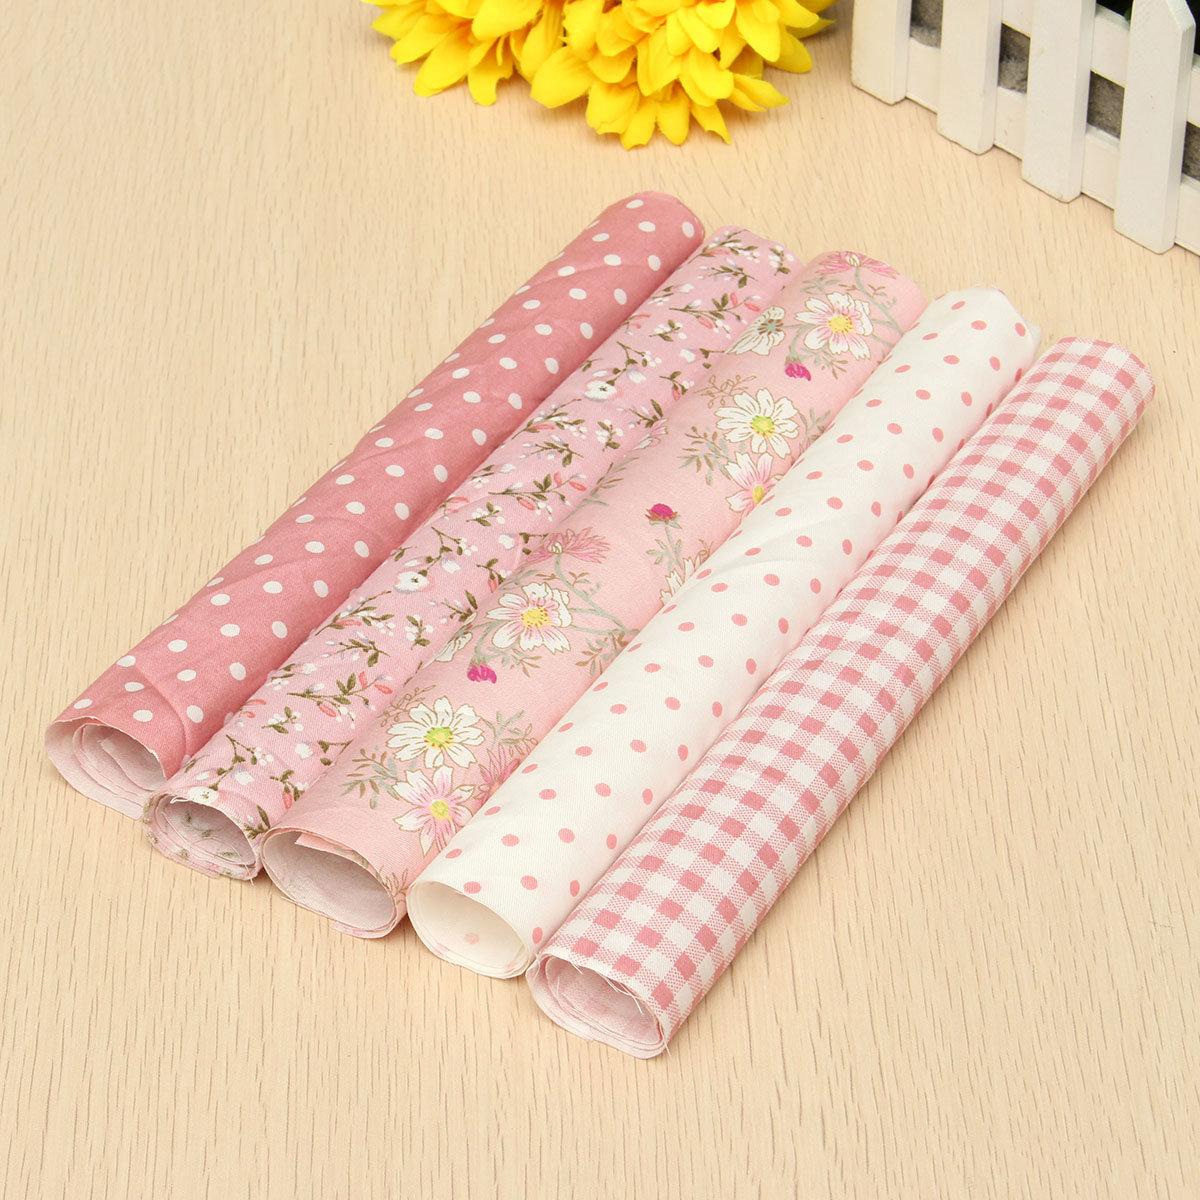 "Dollhouse Naaien 5 Roze Assorted Pre Cut Charm 10 ""Squares Quilt Katoenen Doek Fabric Craft"